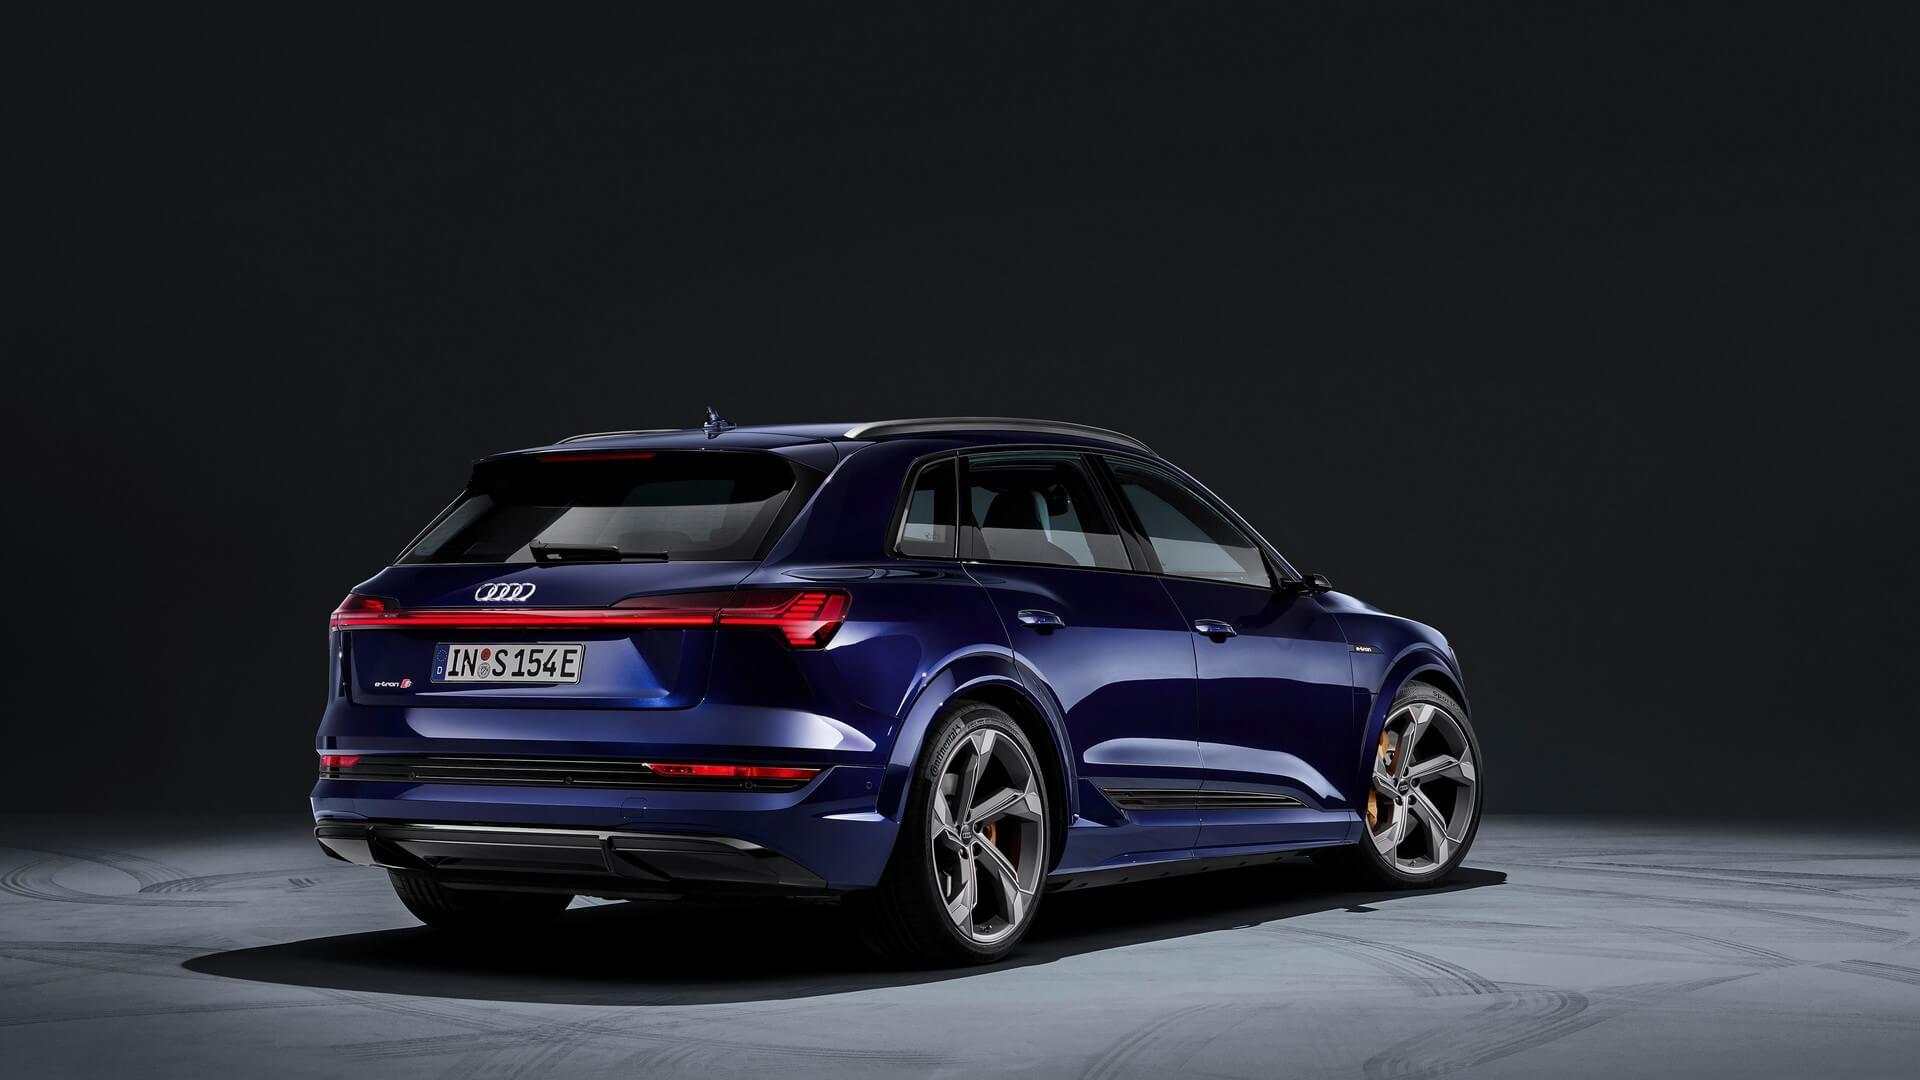 Audi-E-Tron-S-and-E-Tron-S-Sportback-2020-27